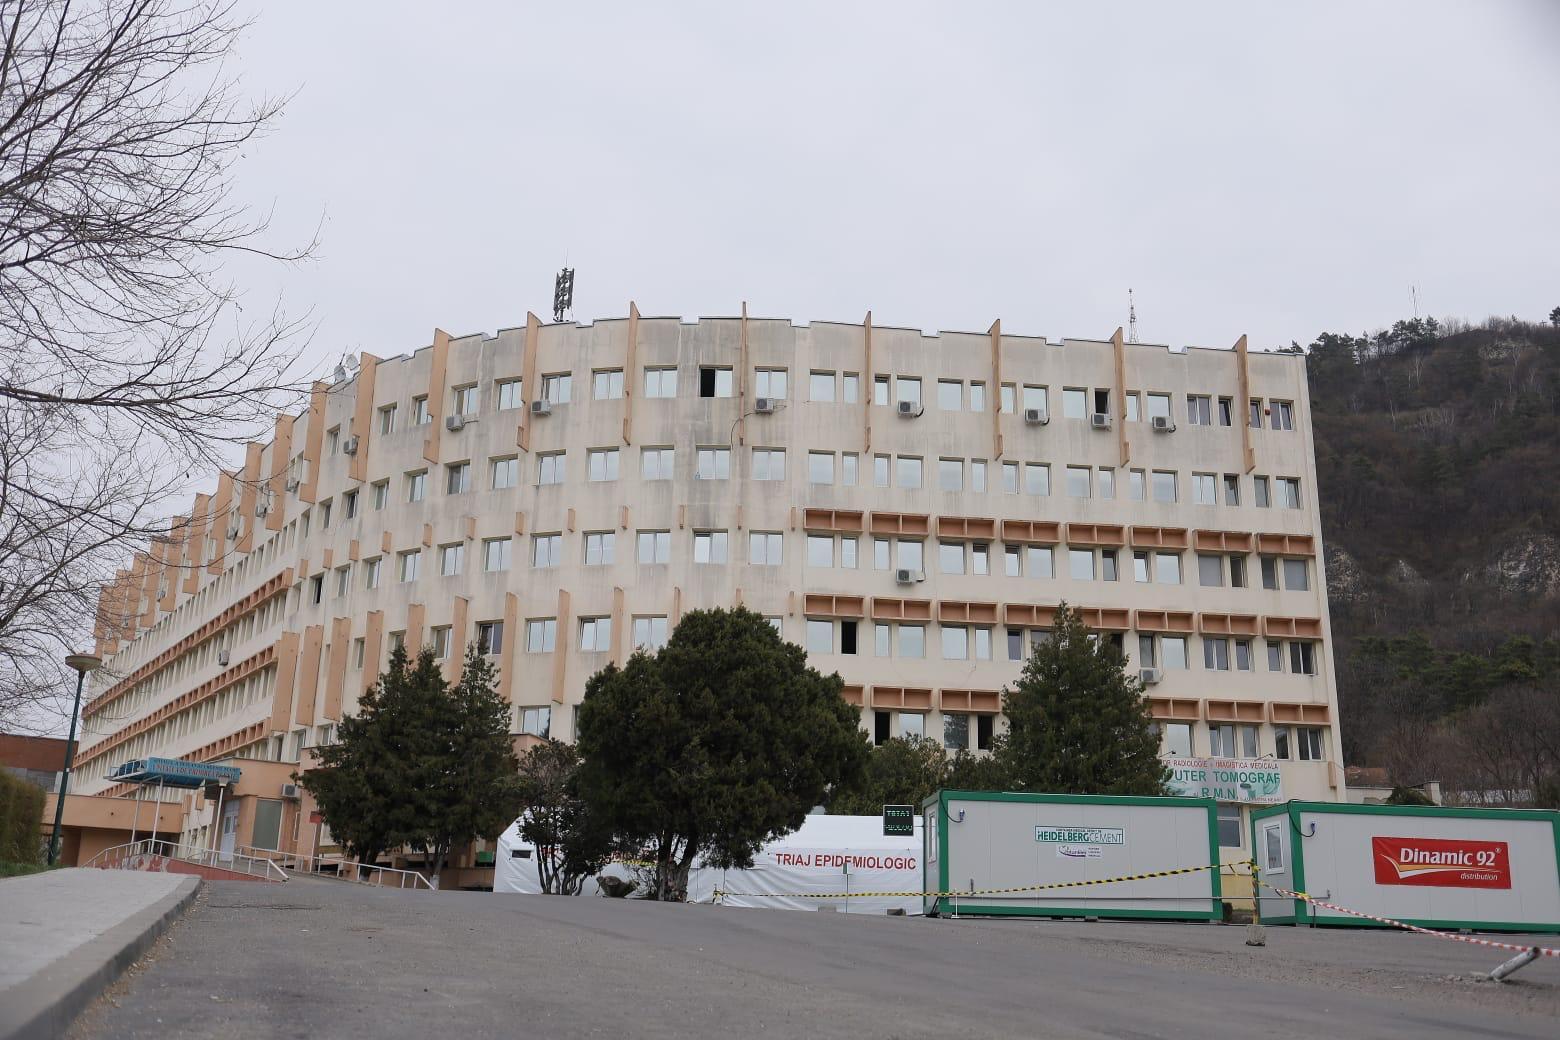 Meniu îmbunătățit pentru pacienții COVID-19 internați la Piatra Neamț